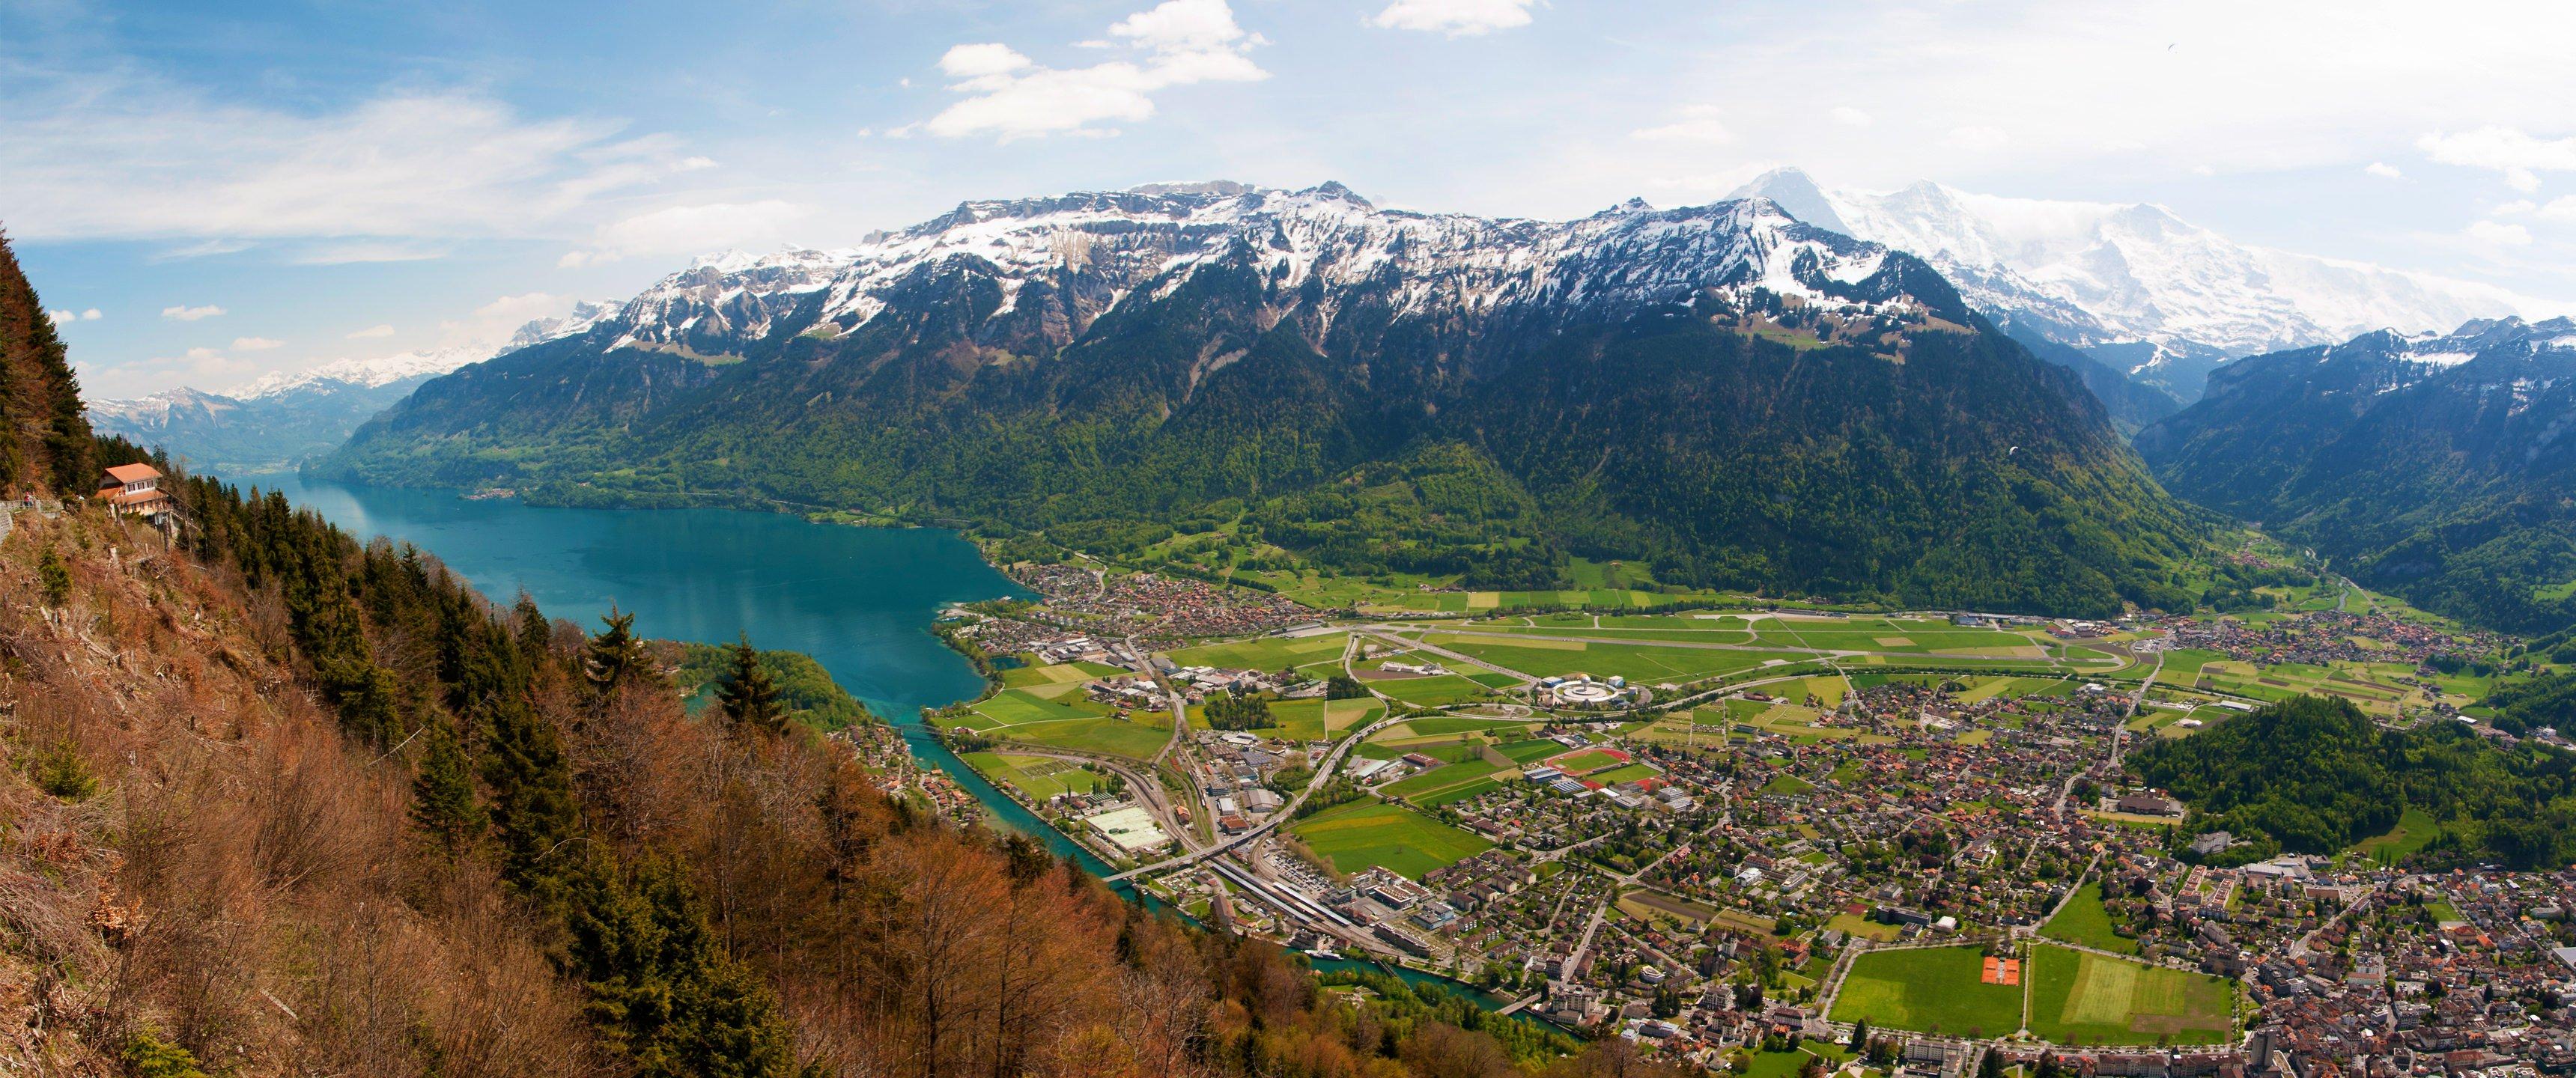 Interlaken   Switzerland HD wallpaper 3440x1440